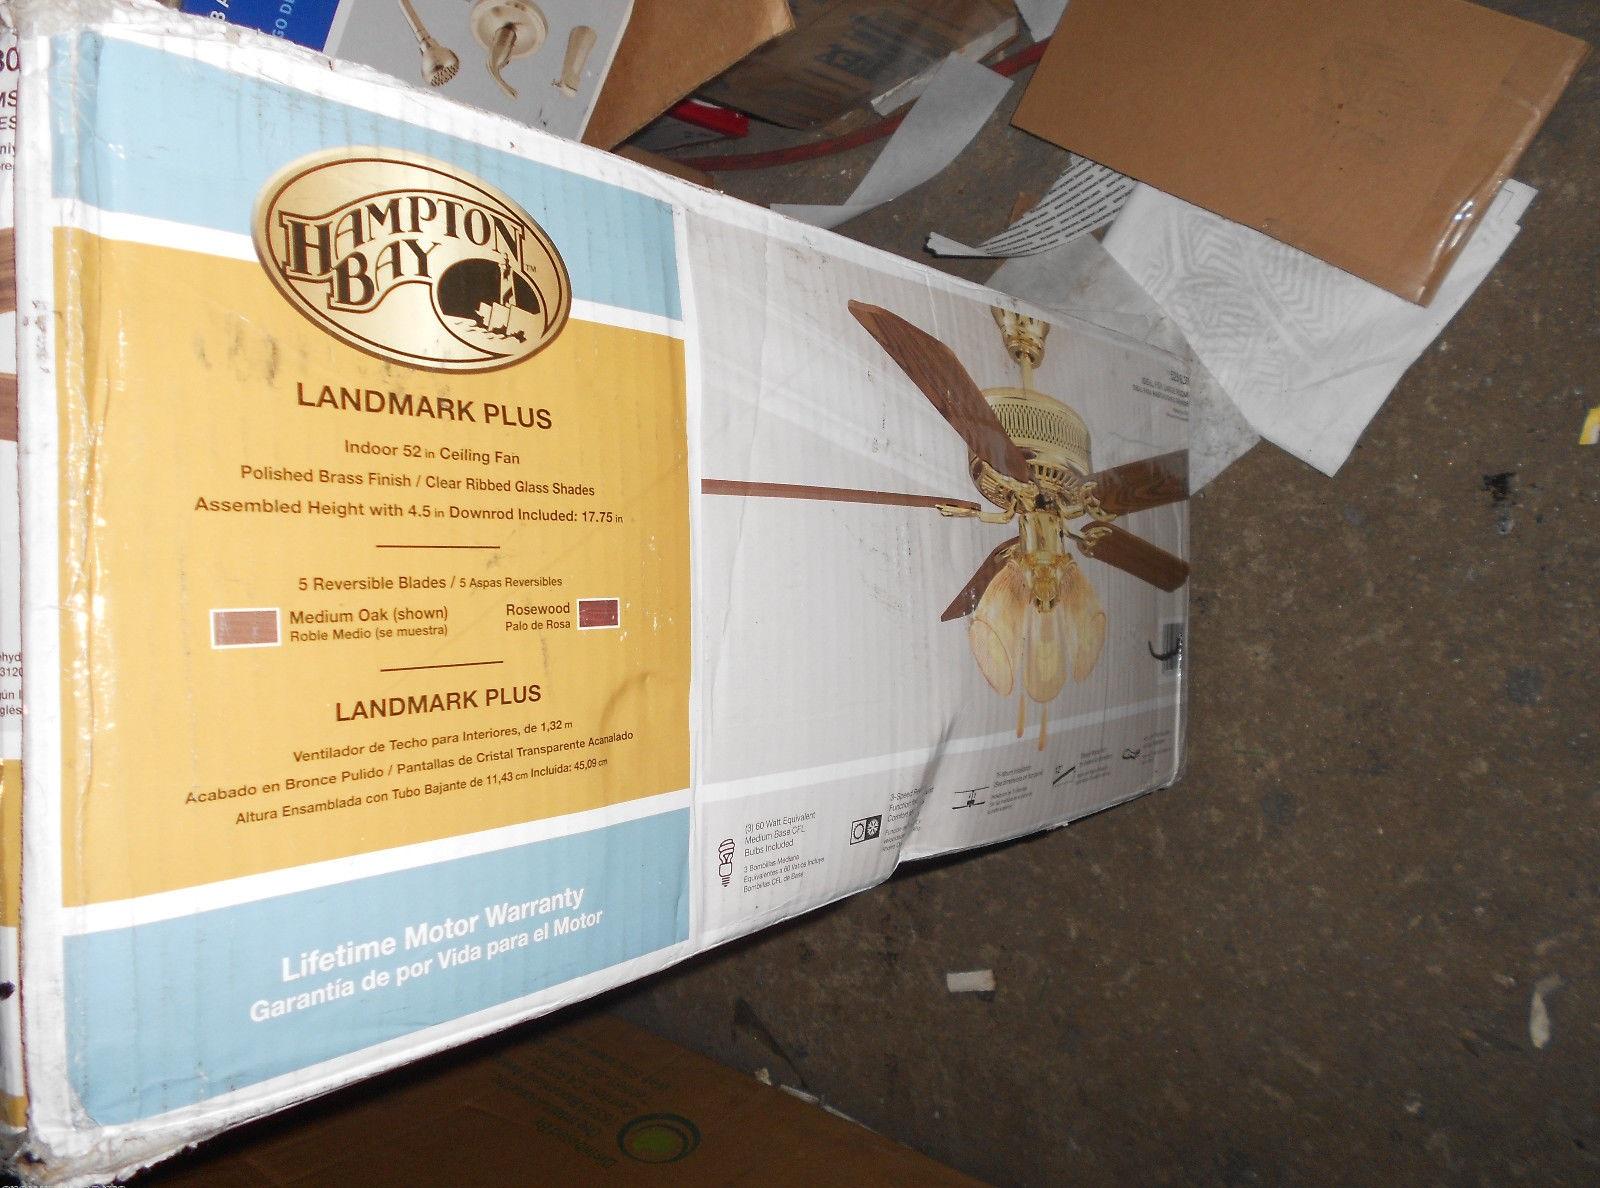 Hampton Bay Hl52qv P 3lc14 Landmark Plus 52 In Indoor Polished Brass Ceiling Fan Pppzae Avi